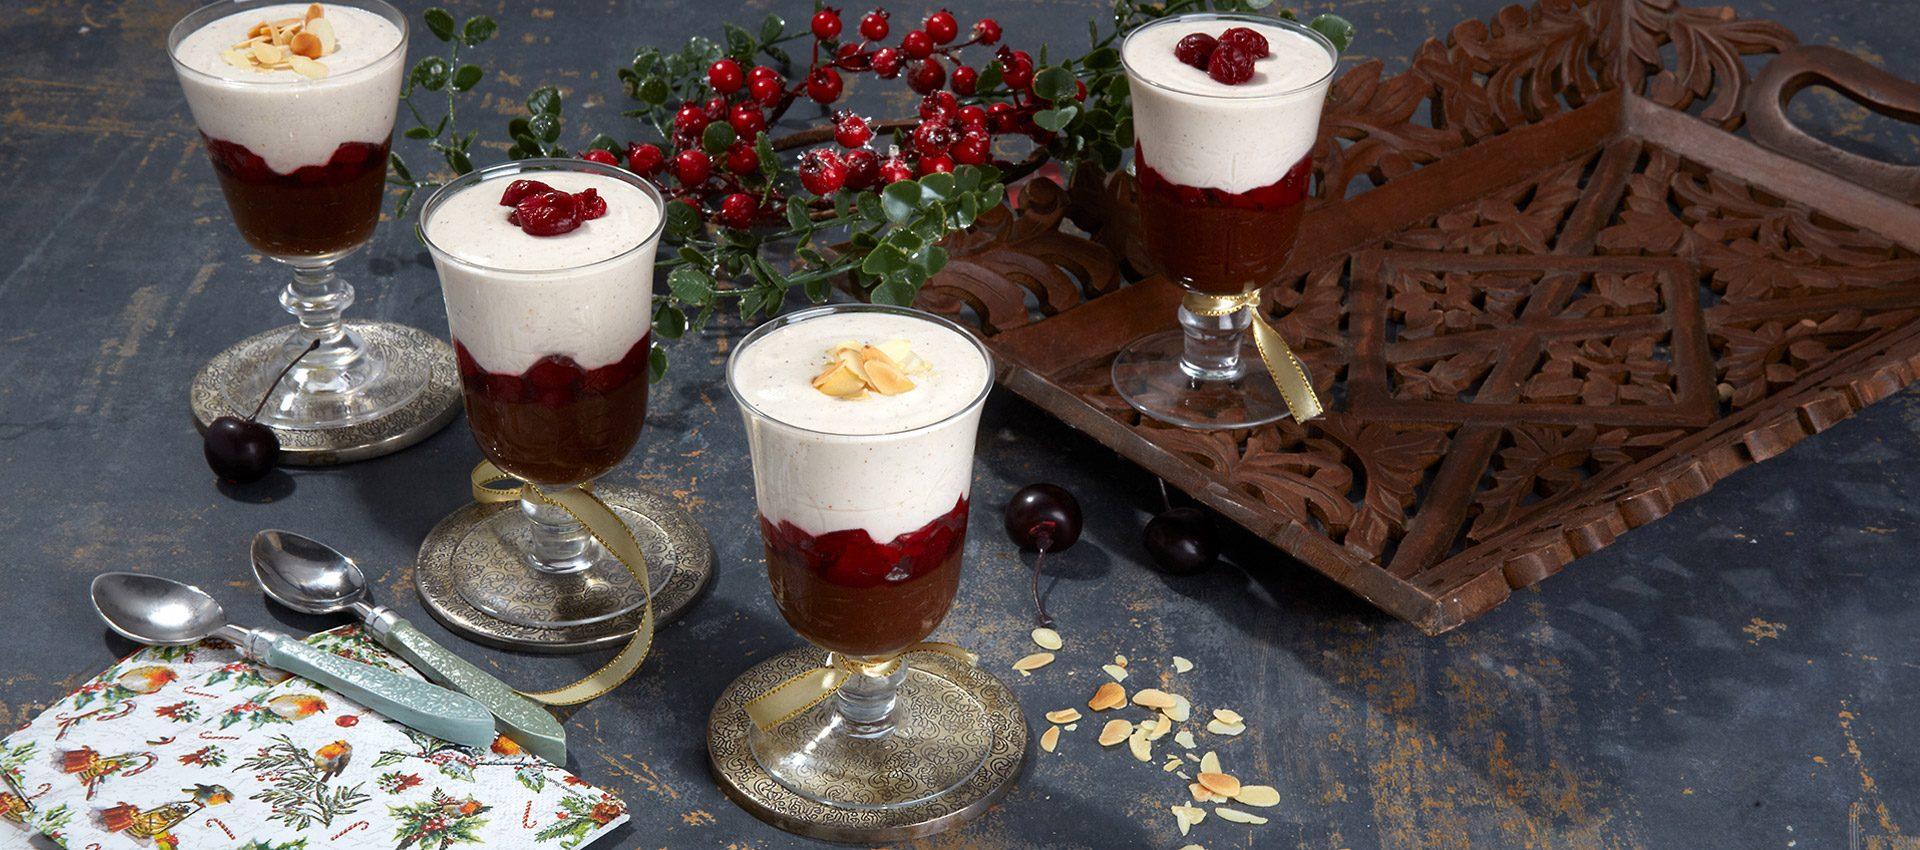 Christmas Vegan Triffles with Violife Creamy Original